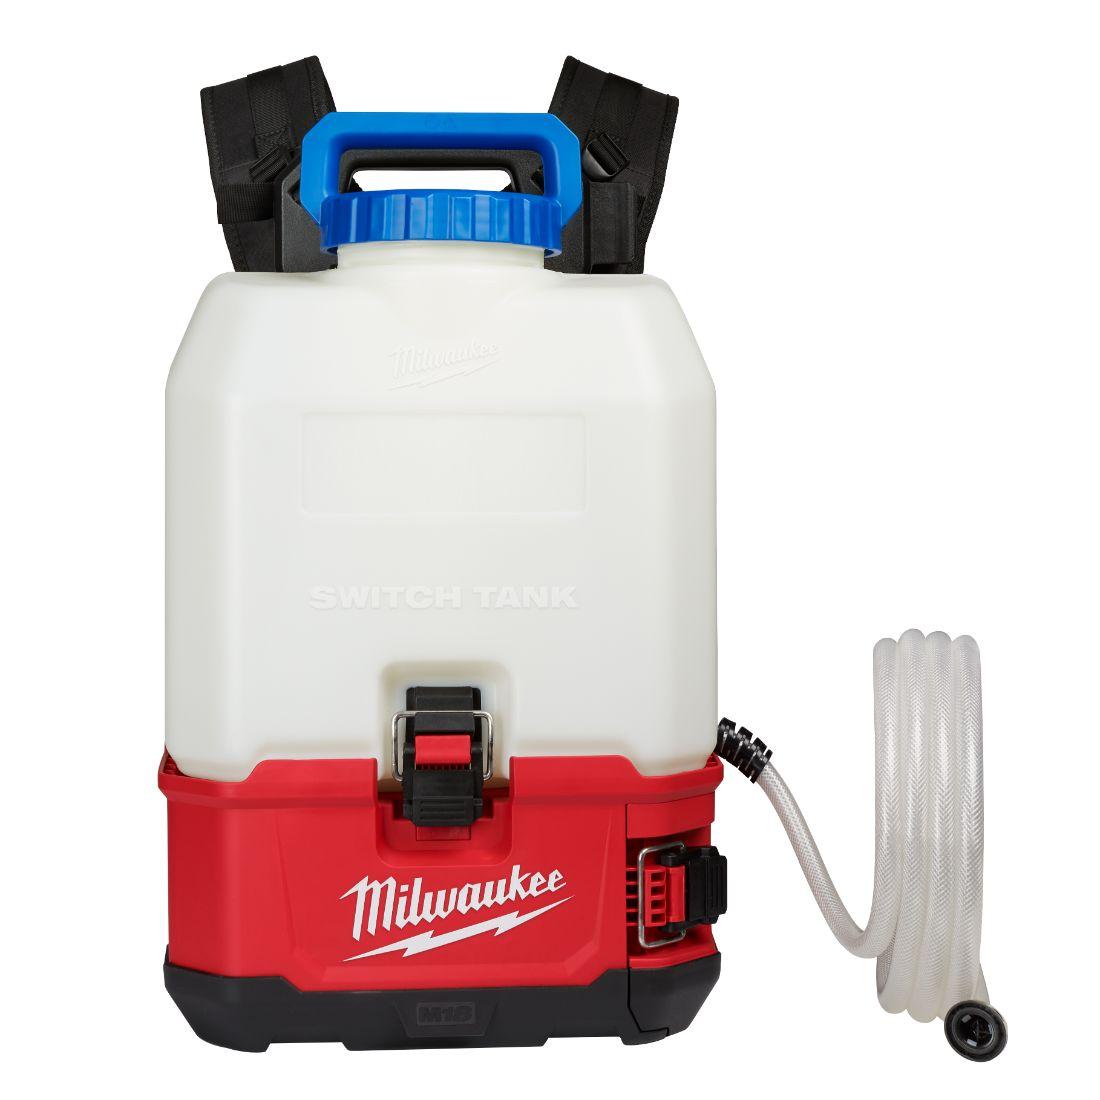 M18 Water Tank Sprayer (Tool Only)